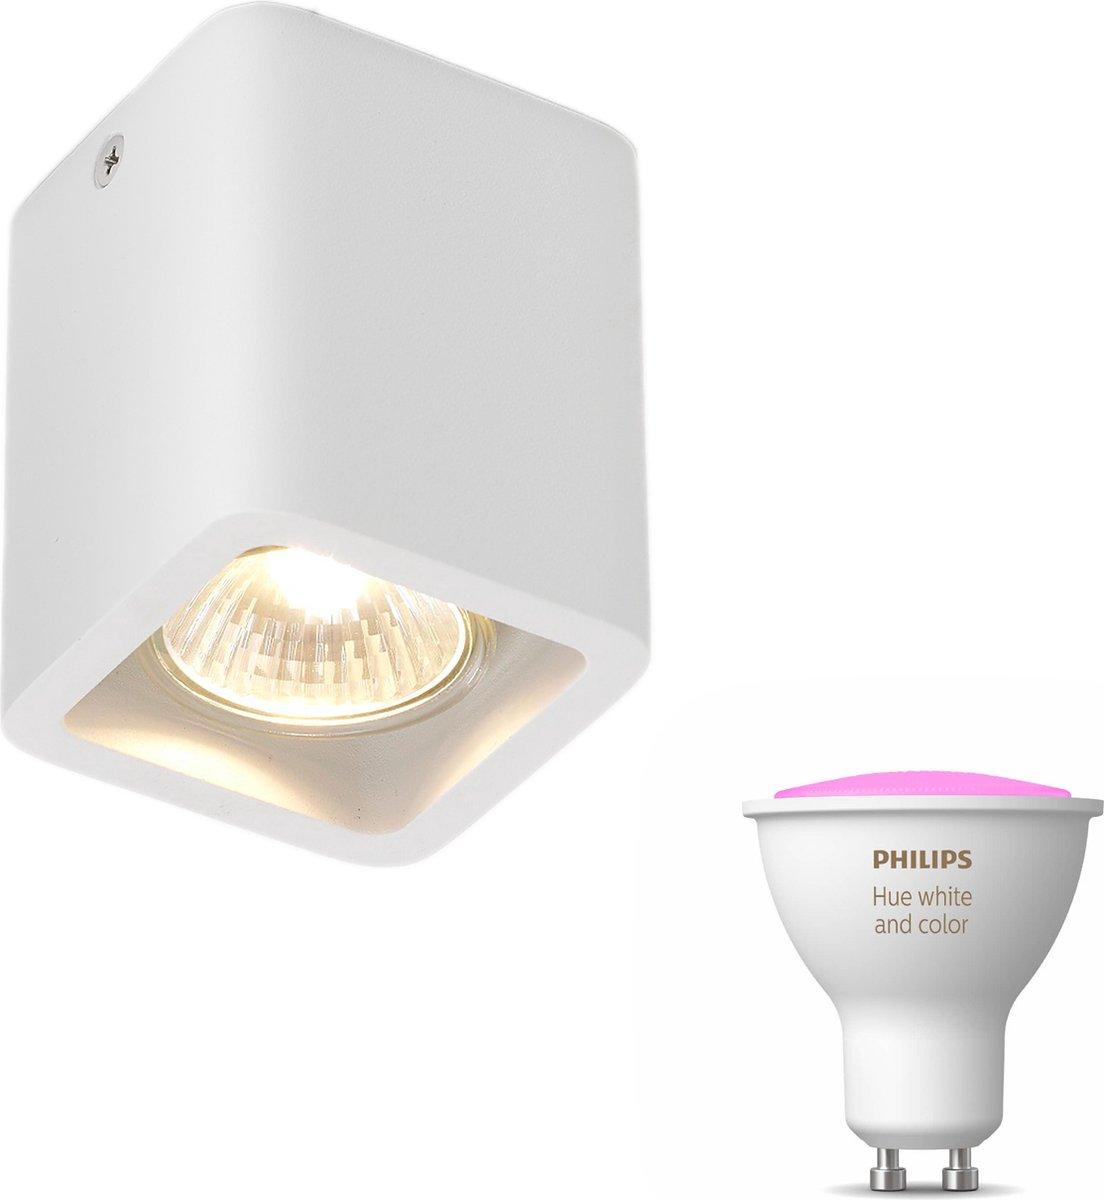 Artdelight Mona opbouwspot - wit - 1 lichtpunt - Incl. Philips Hue White & Color Ambiance Gu10